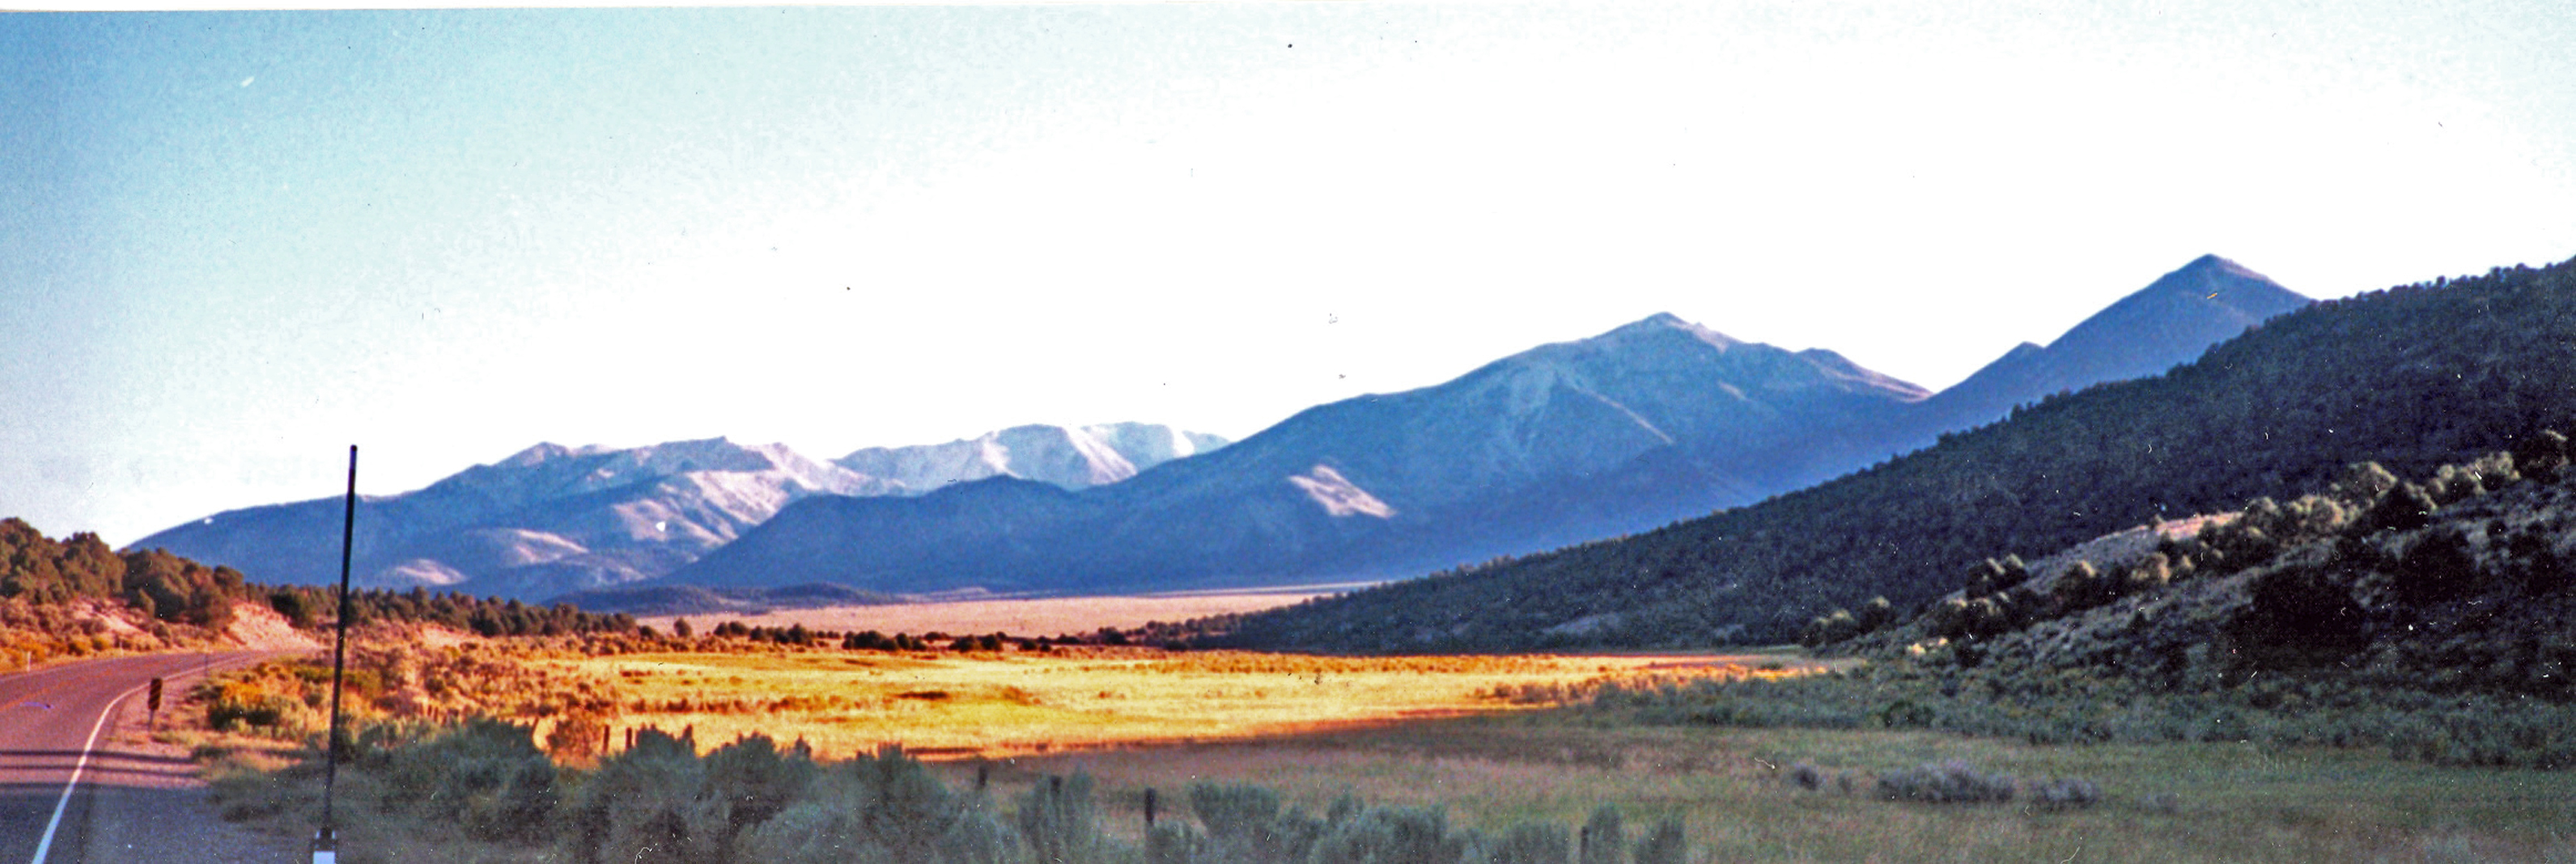 Yerington Nevada